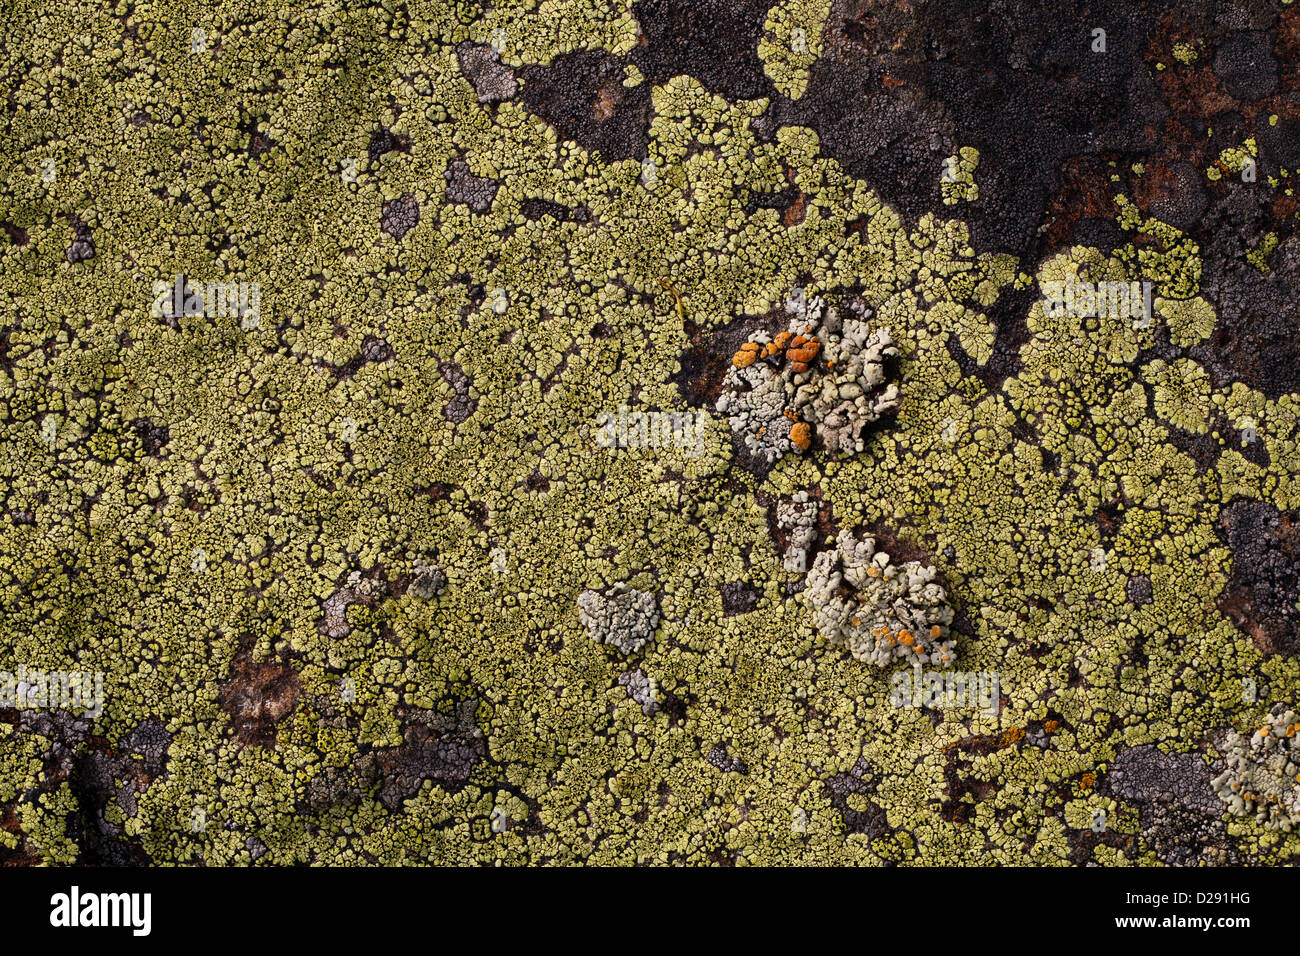 Fungi Algae Stock Photos Amp Fungi Algae Stock Images Alamy